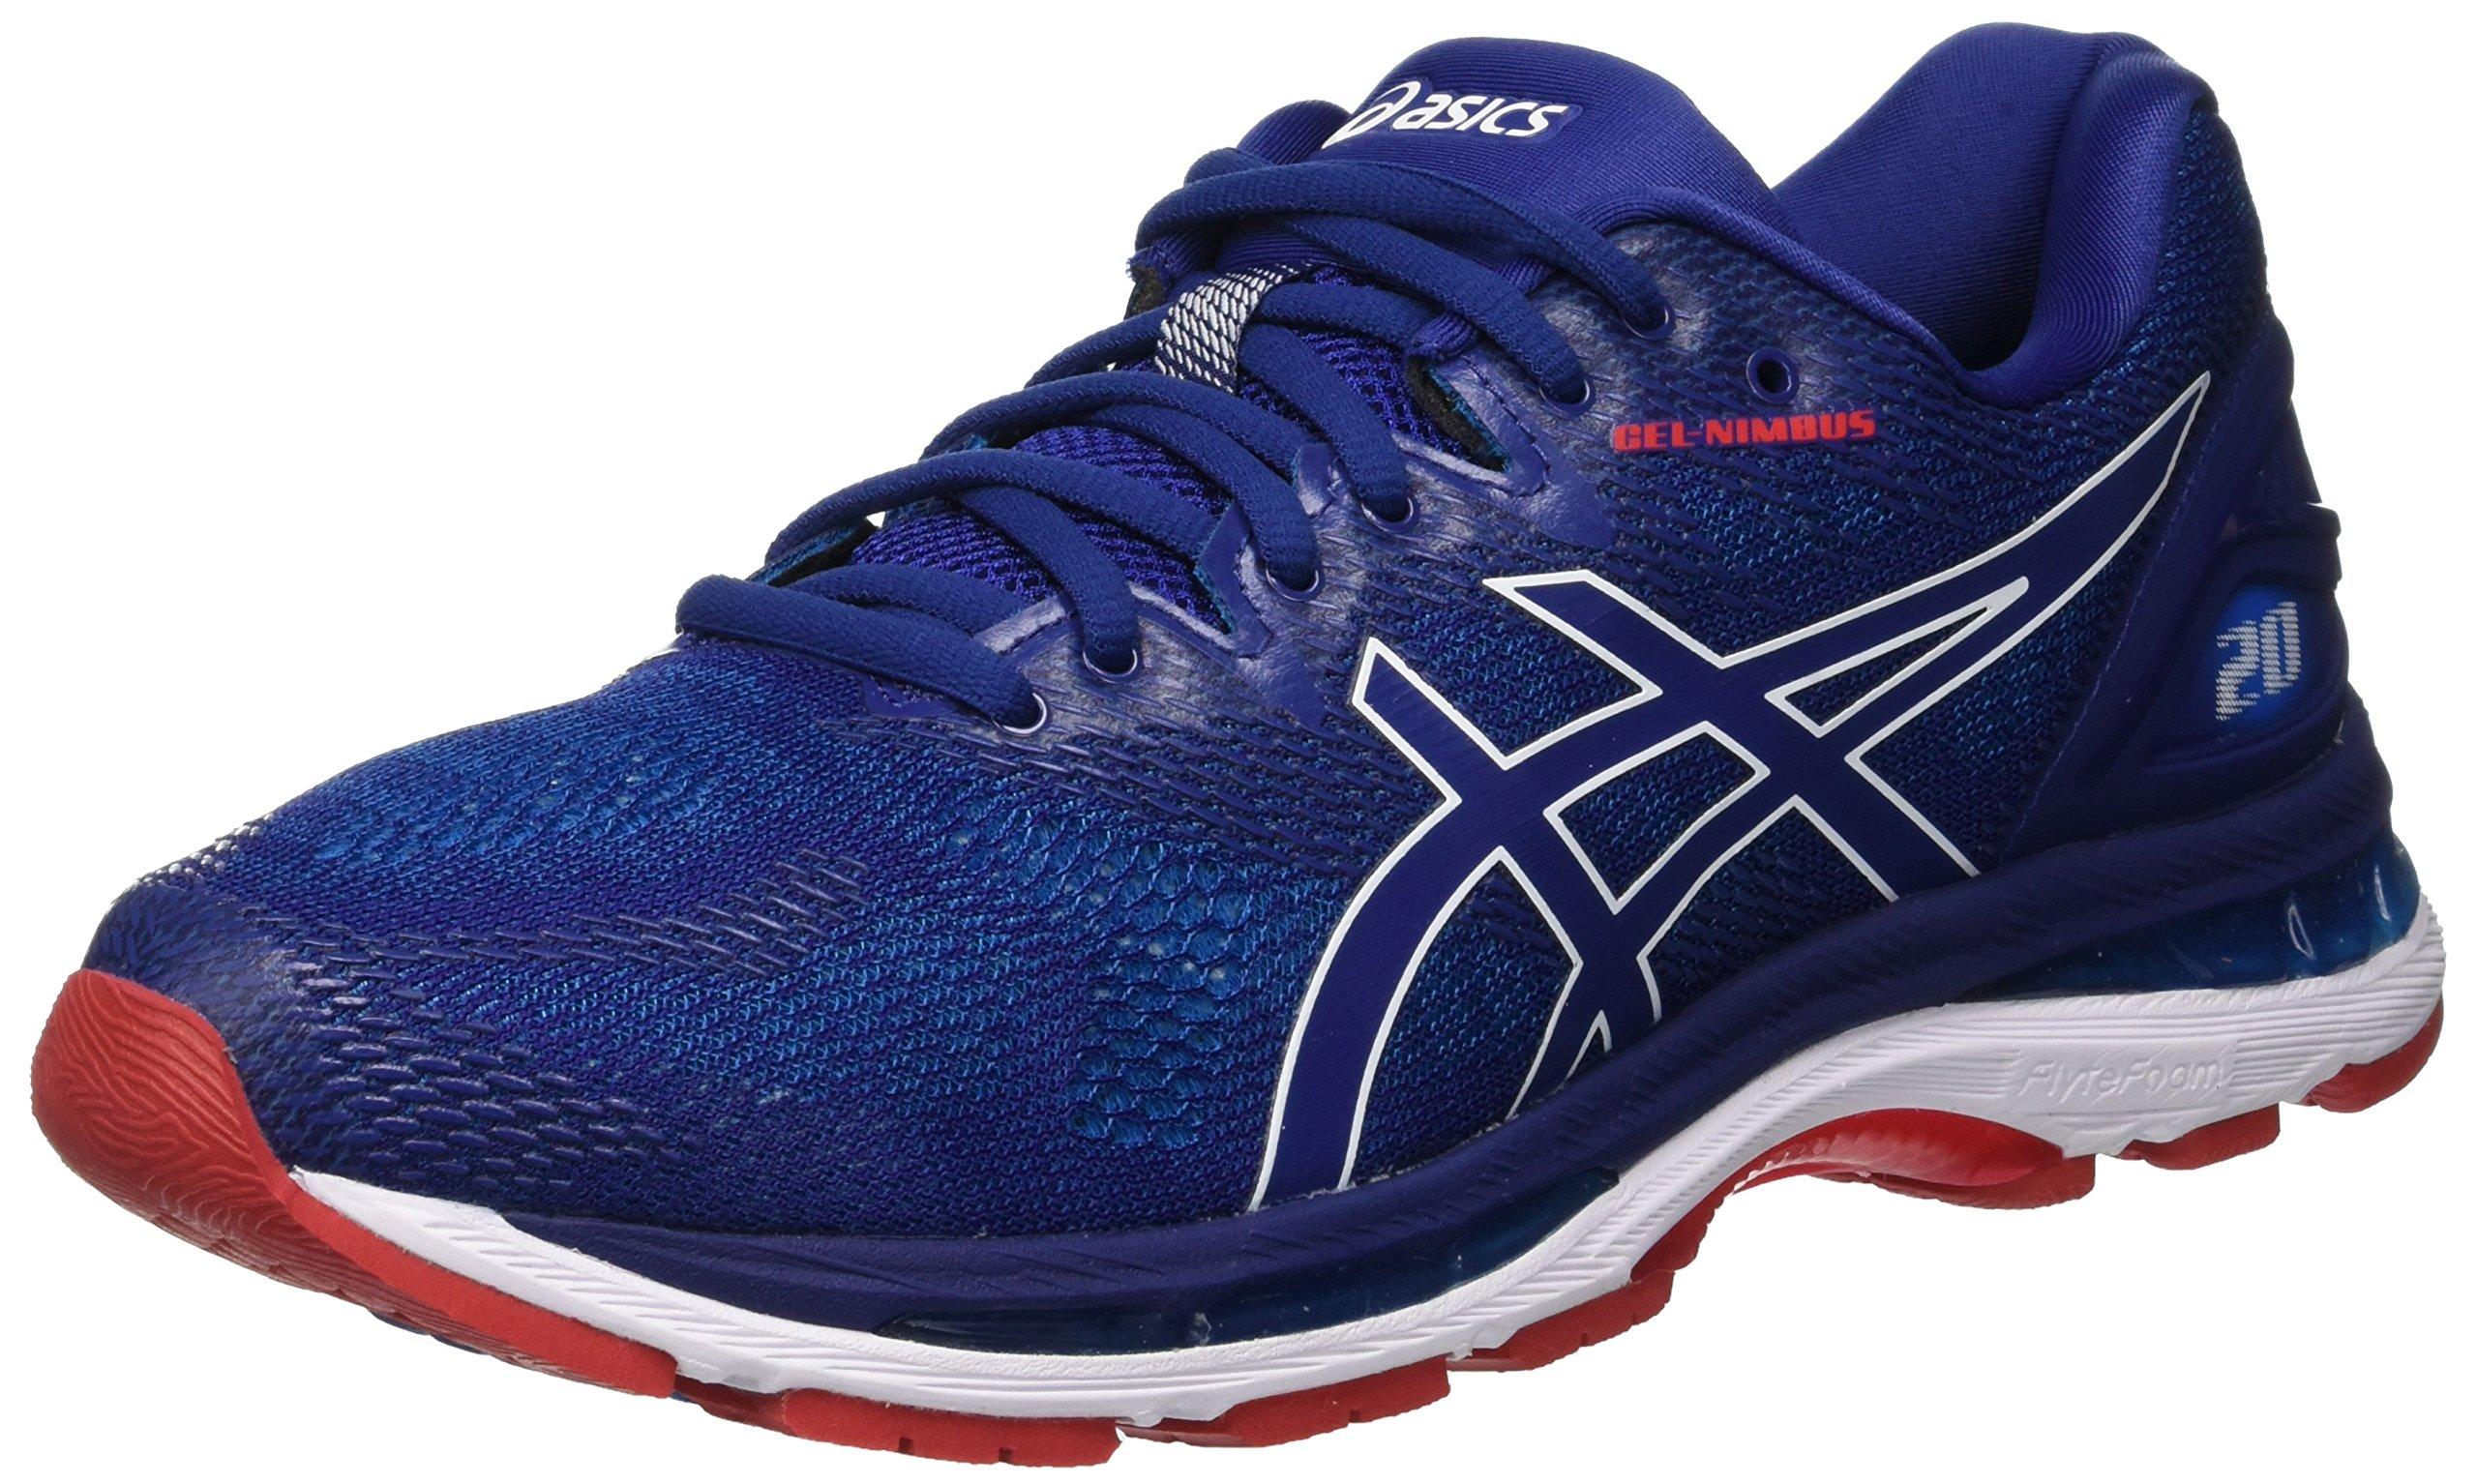 huge discount 75f7c 97e76 ASICS Gel-Nimbus 20, Chaussures de Running Homme product image